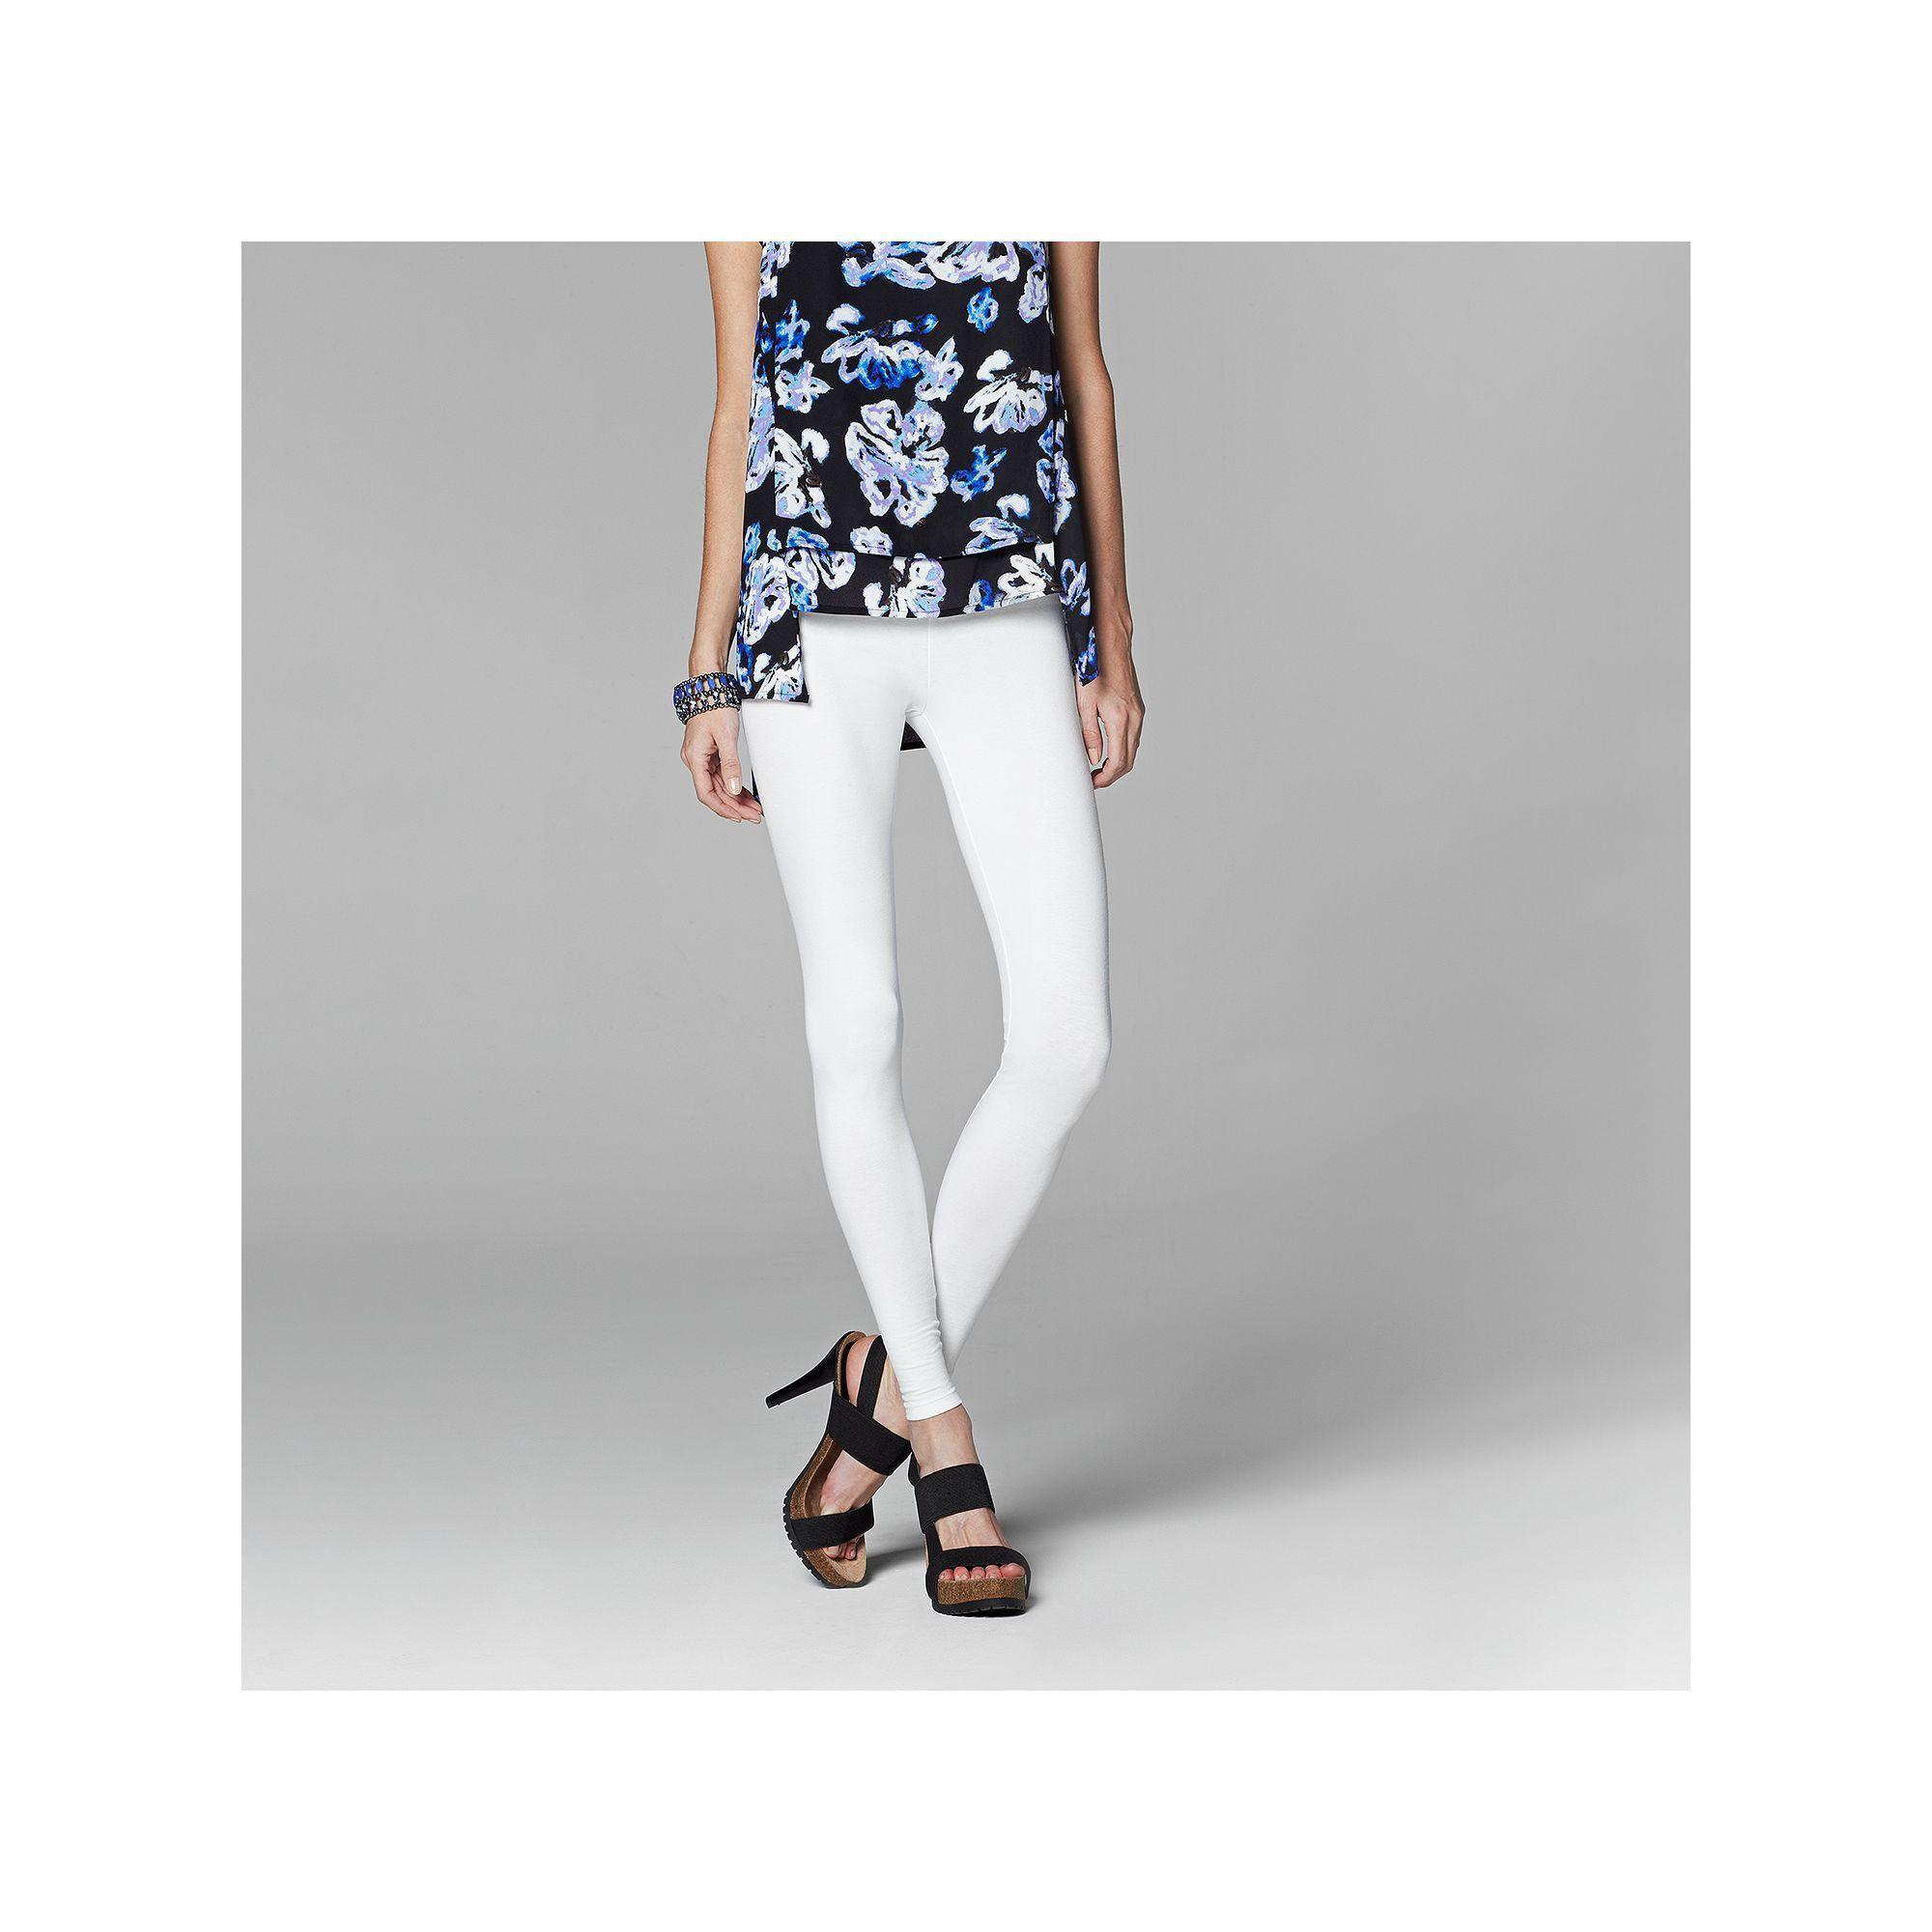 8c47a1cc13de9a Women's Simply Vera Vera Wang Solid Leggings, Size: Medium, White ...